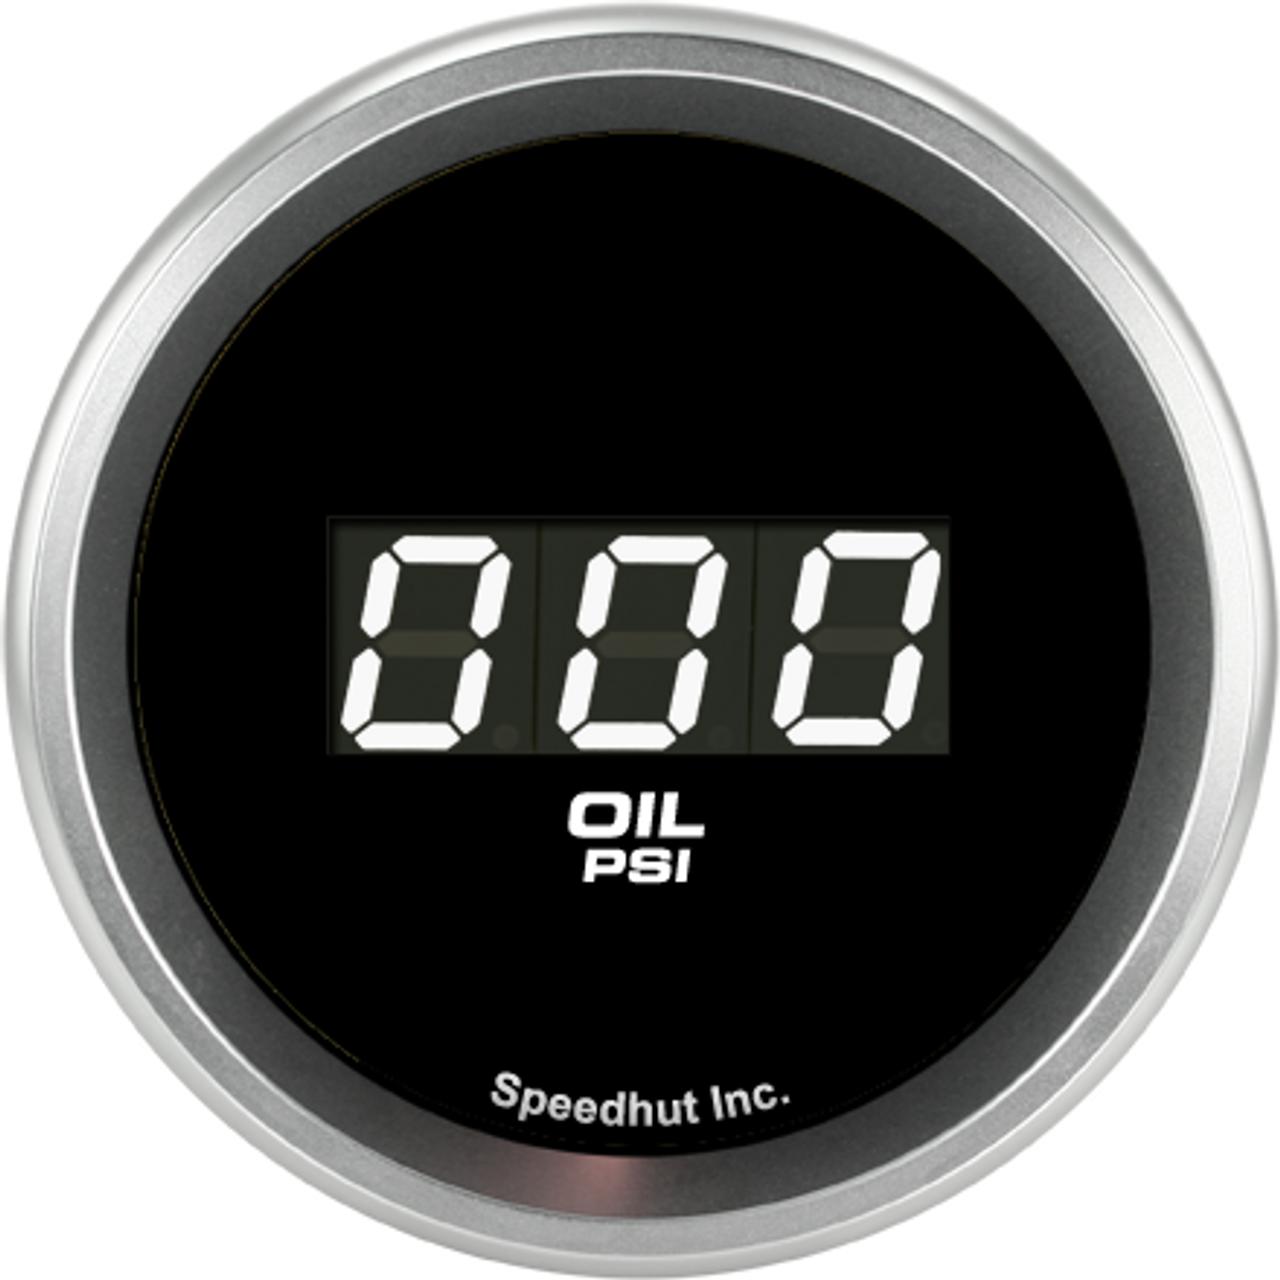 "2-1/16"" Oil Pressure Digital Gauge 0-100psi"